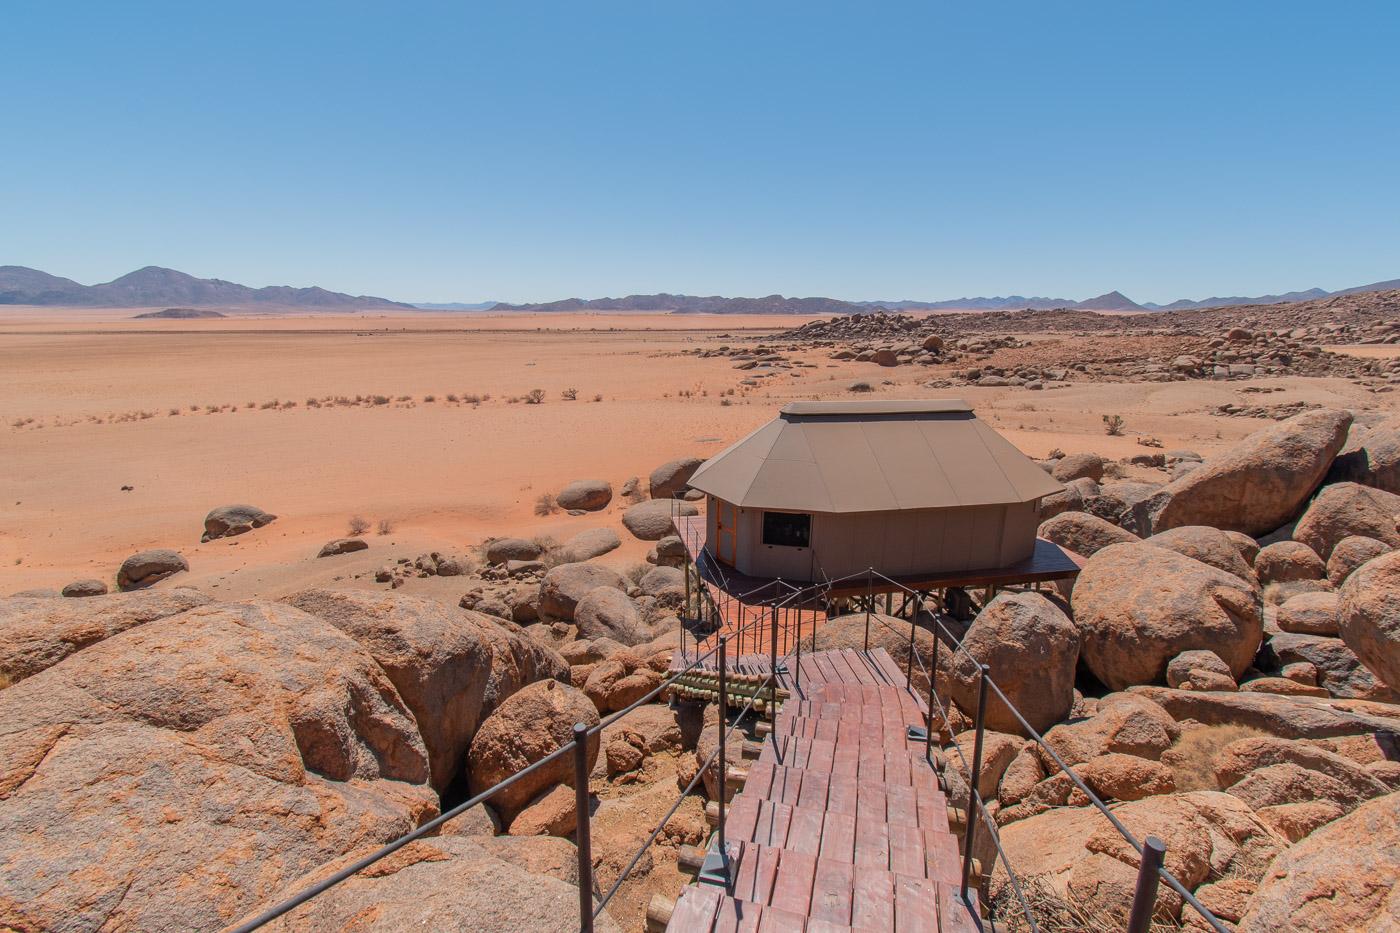 Route Namibie sonop onze tent